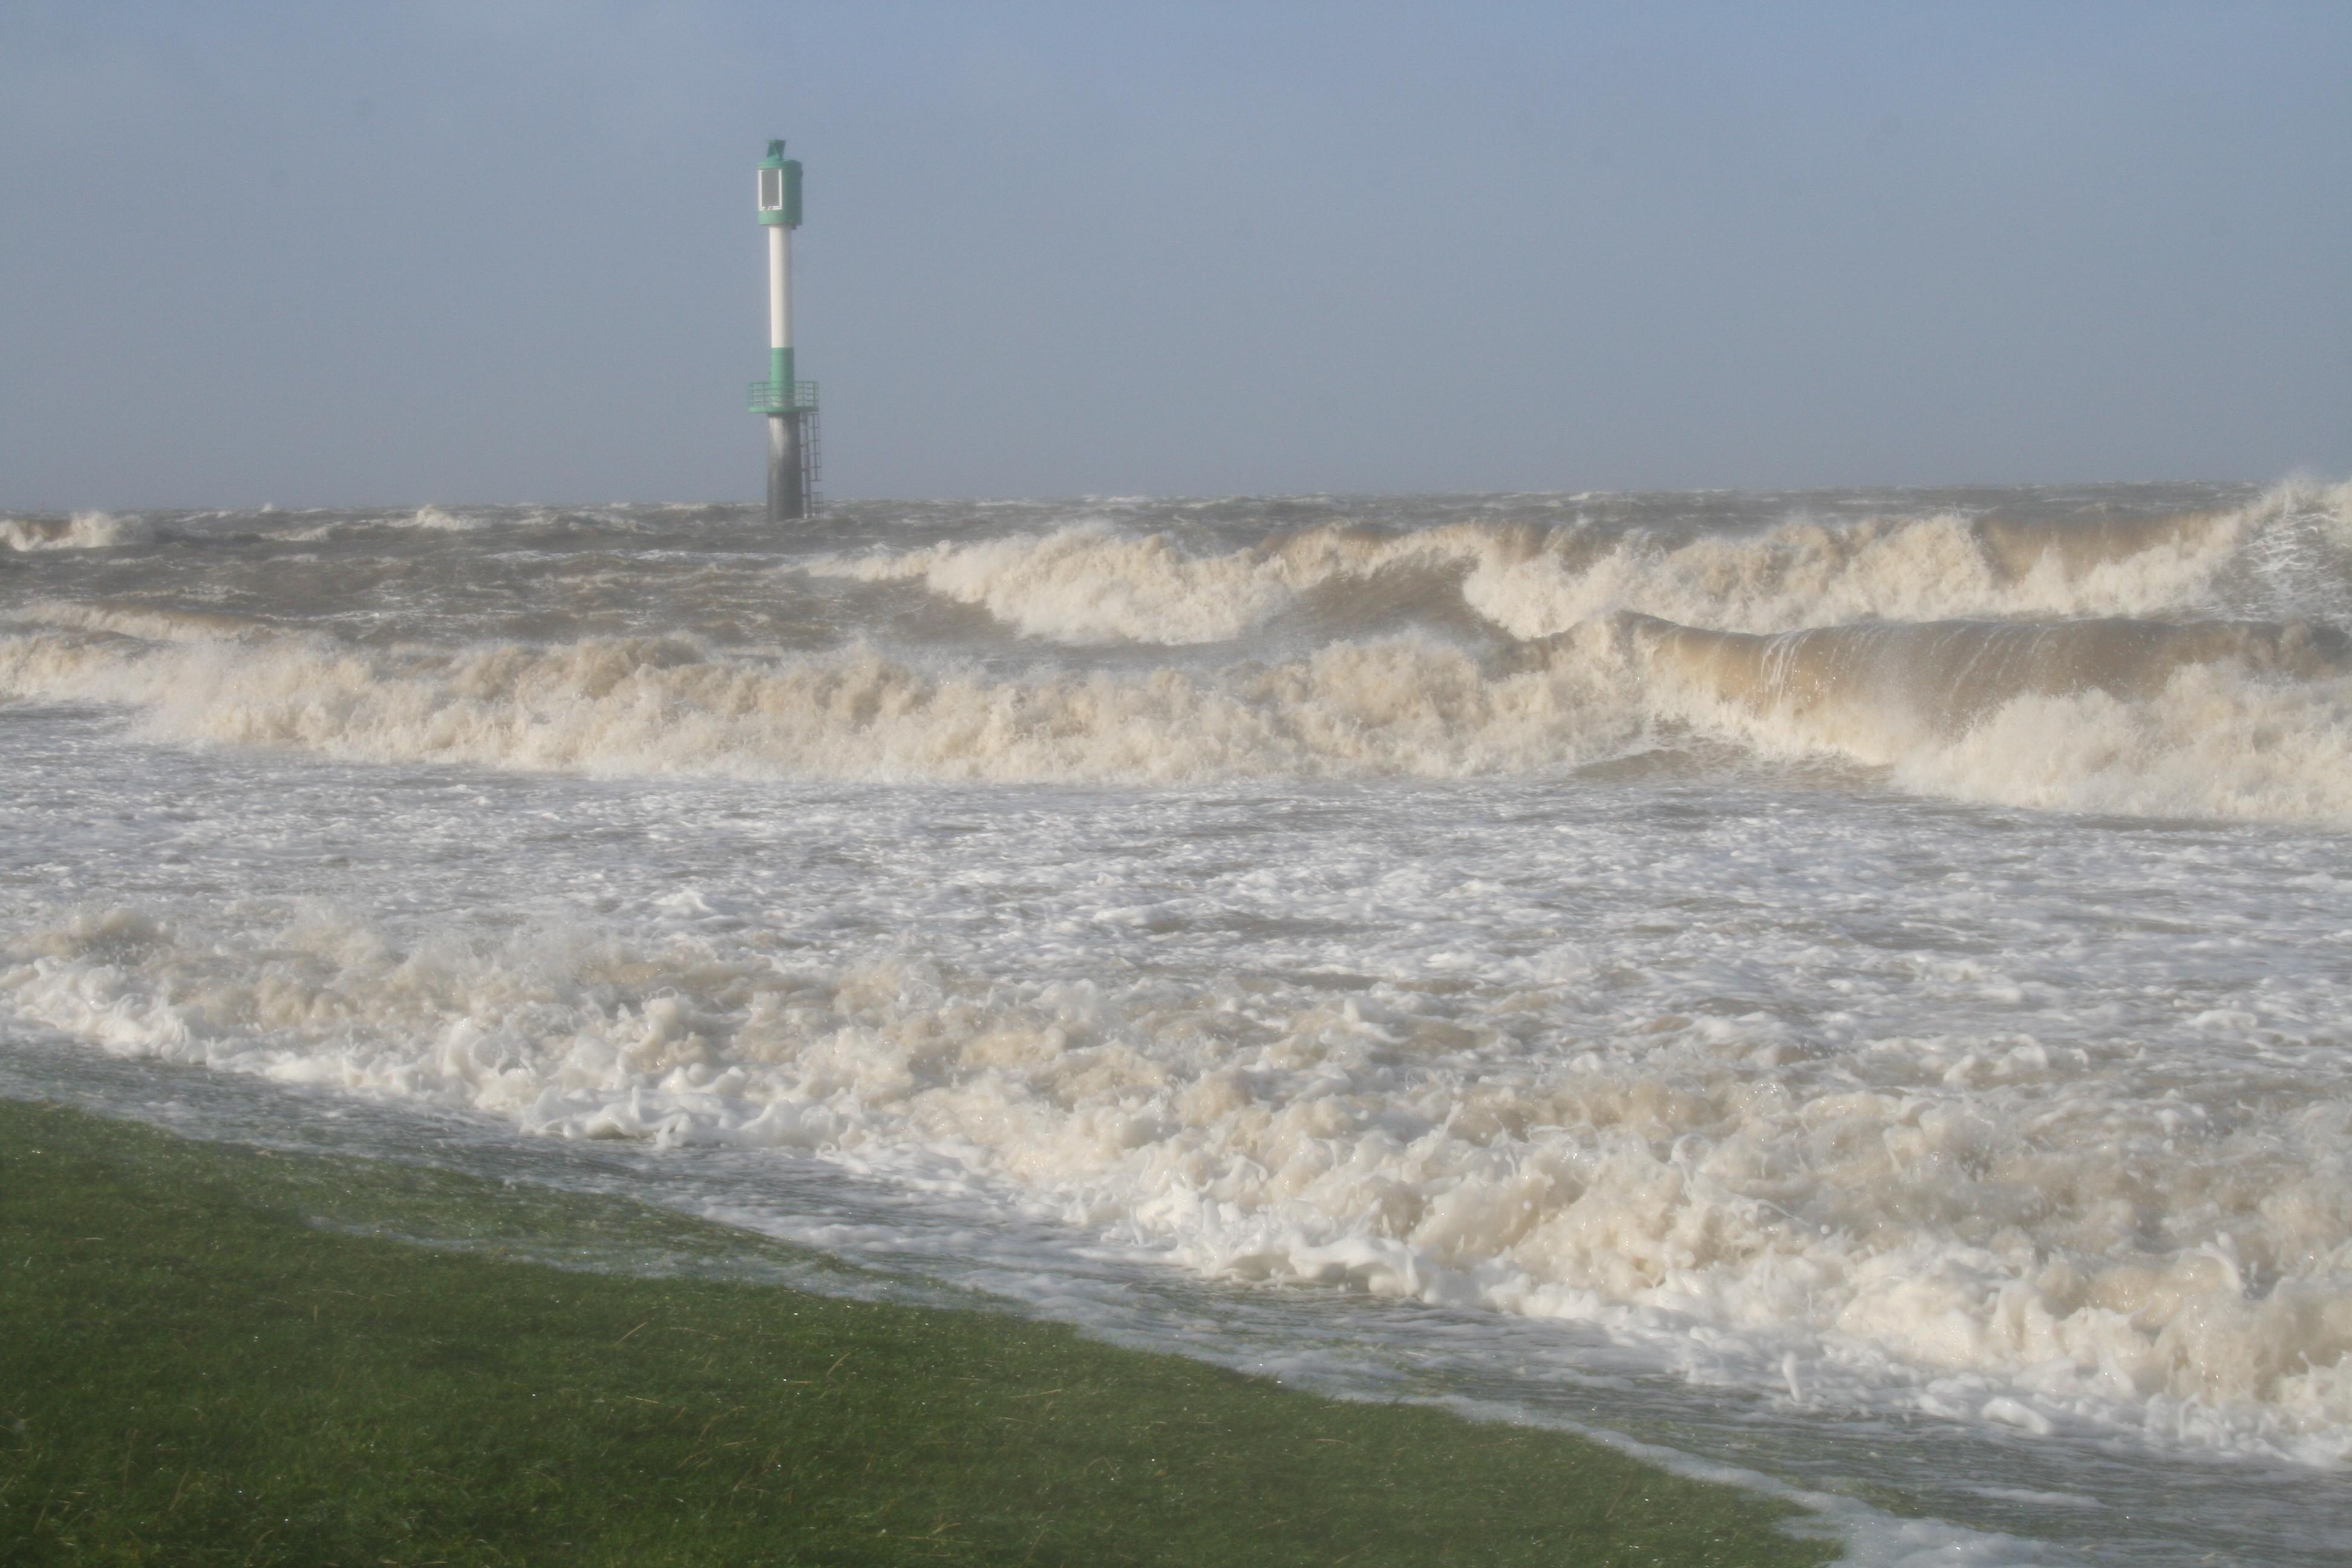 File:Glameyer Stack schwere Sturmflut 2007 11 09.JPG - Wikimedia ...